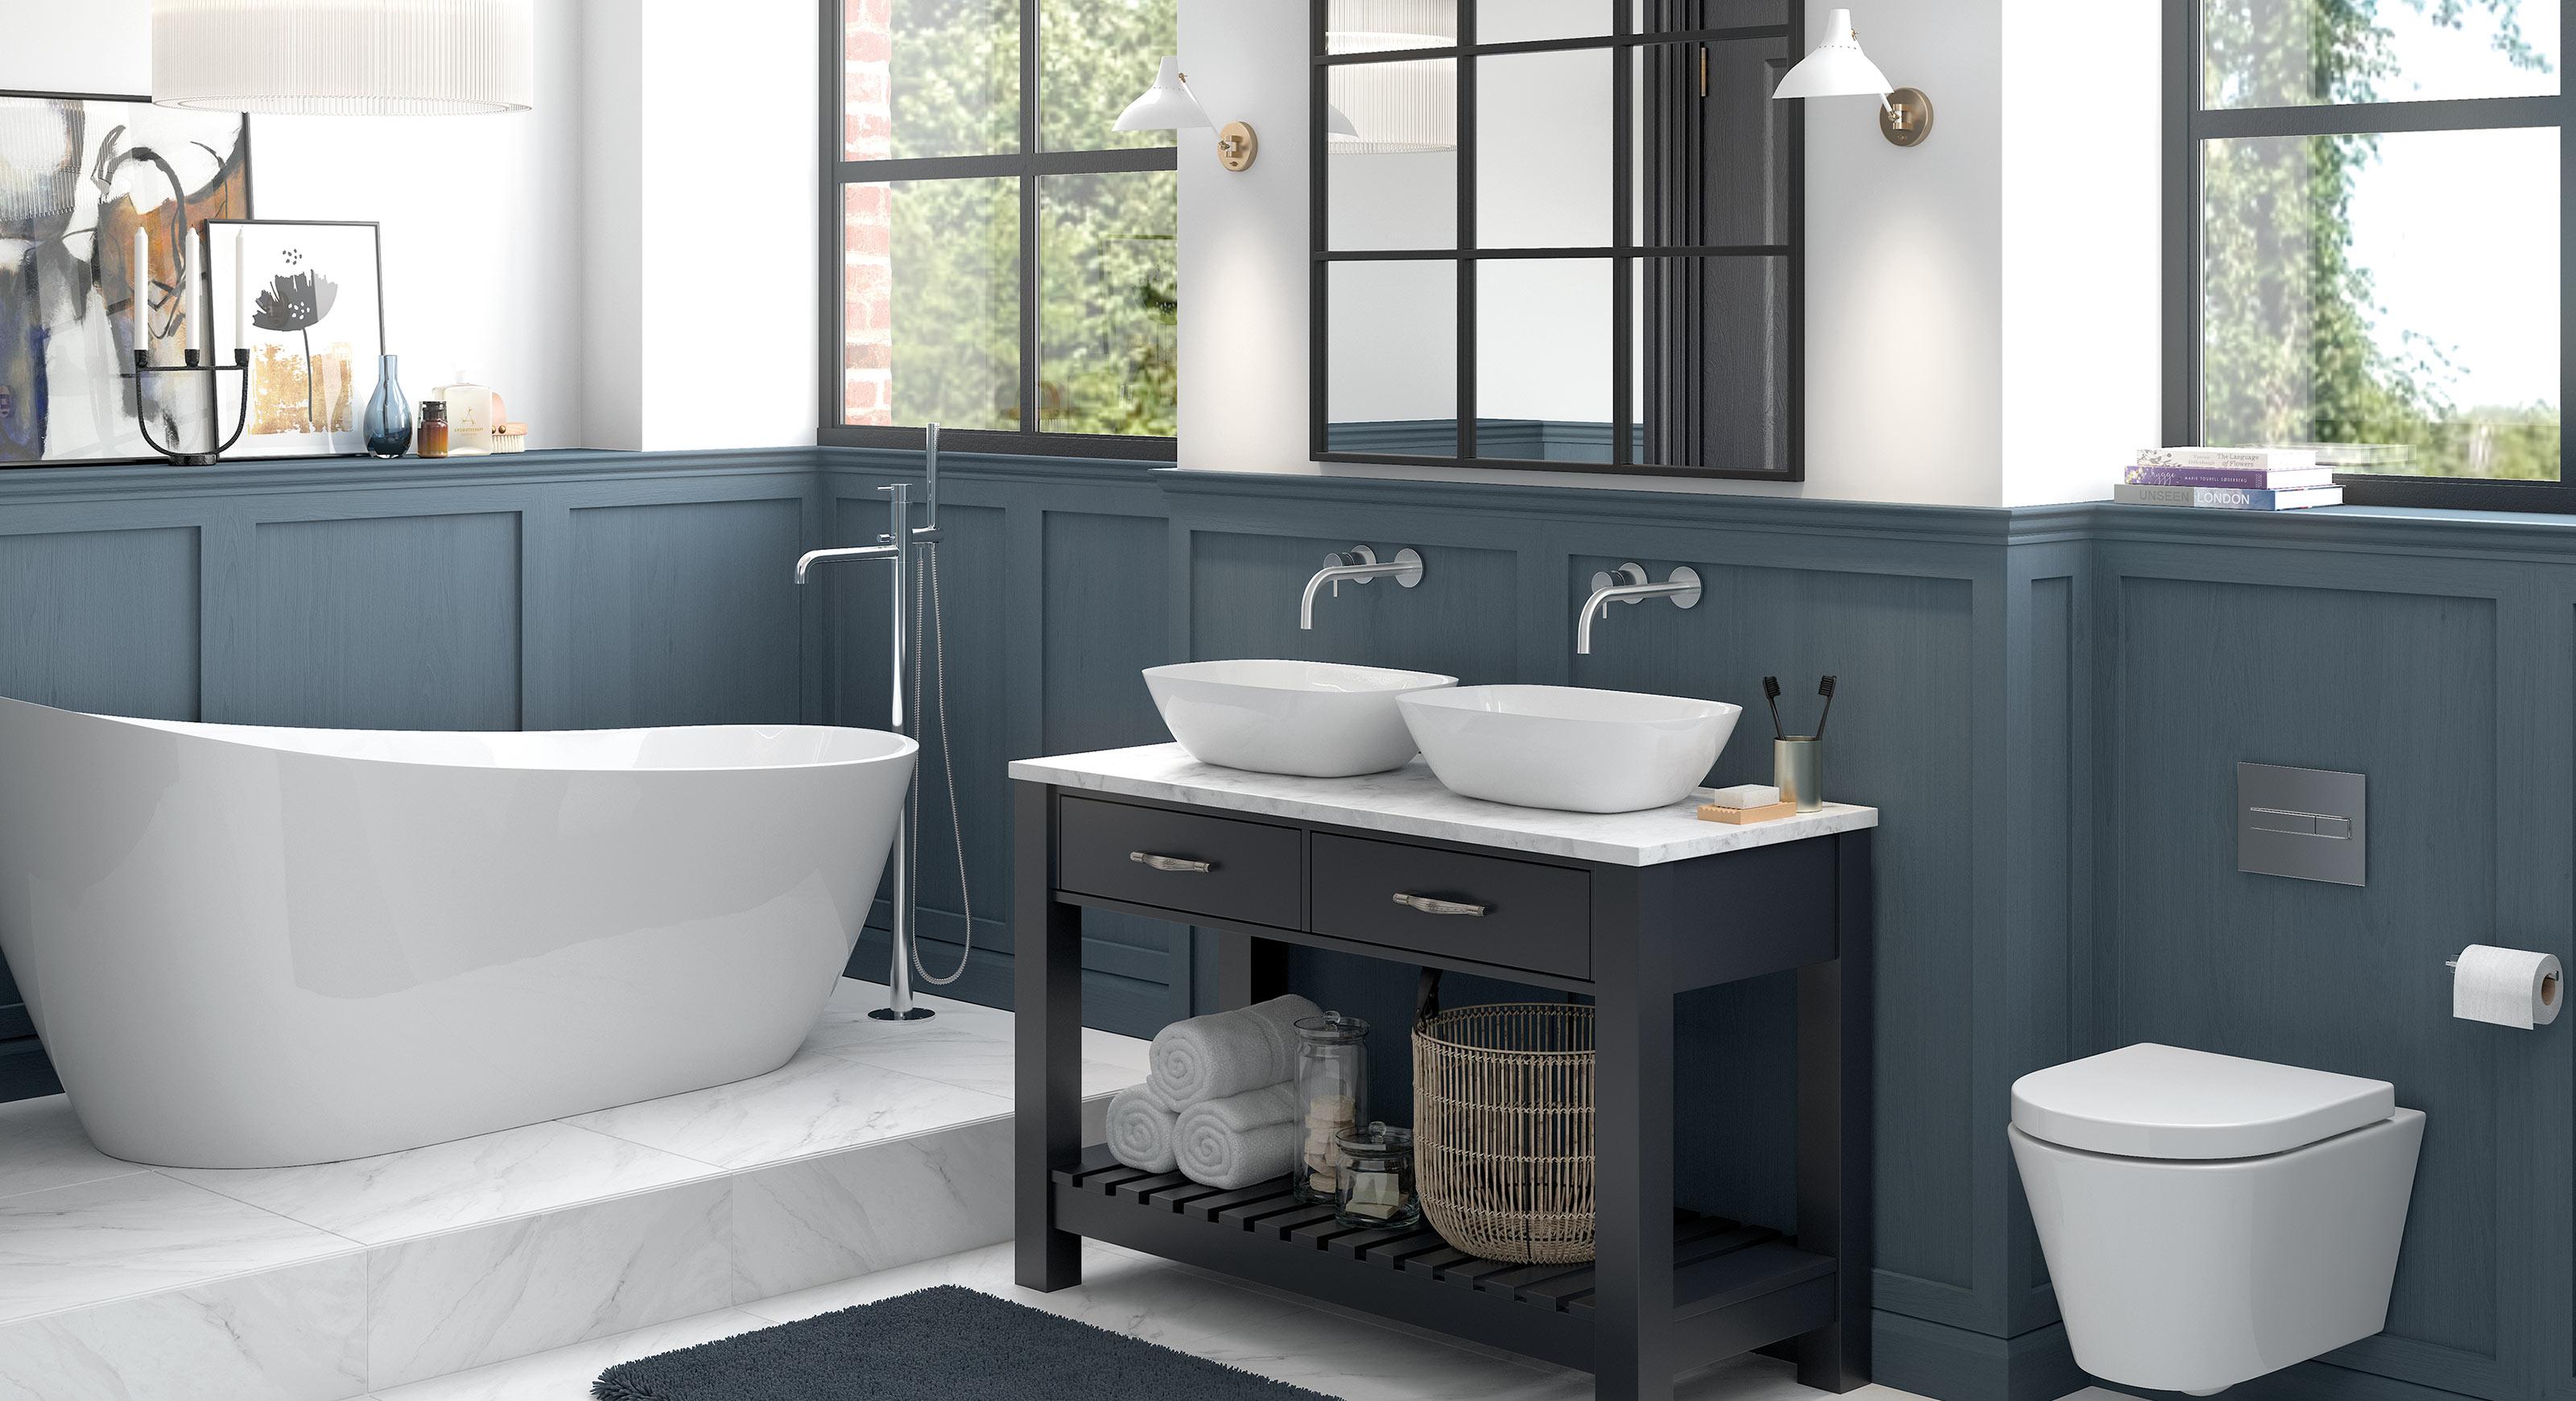 4 Bathroom Design Mistakes to Avoid